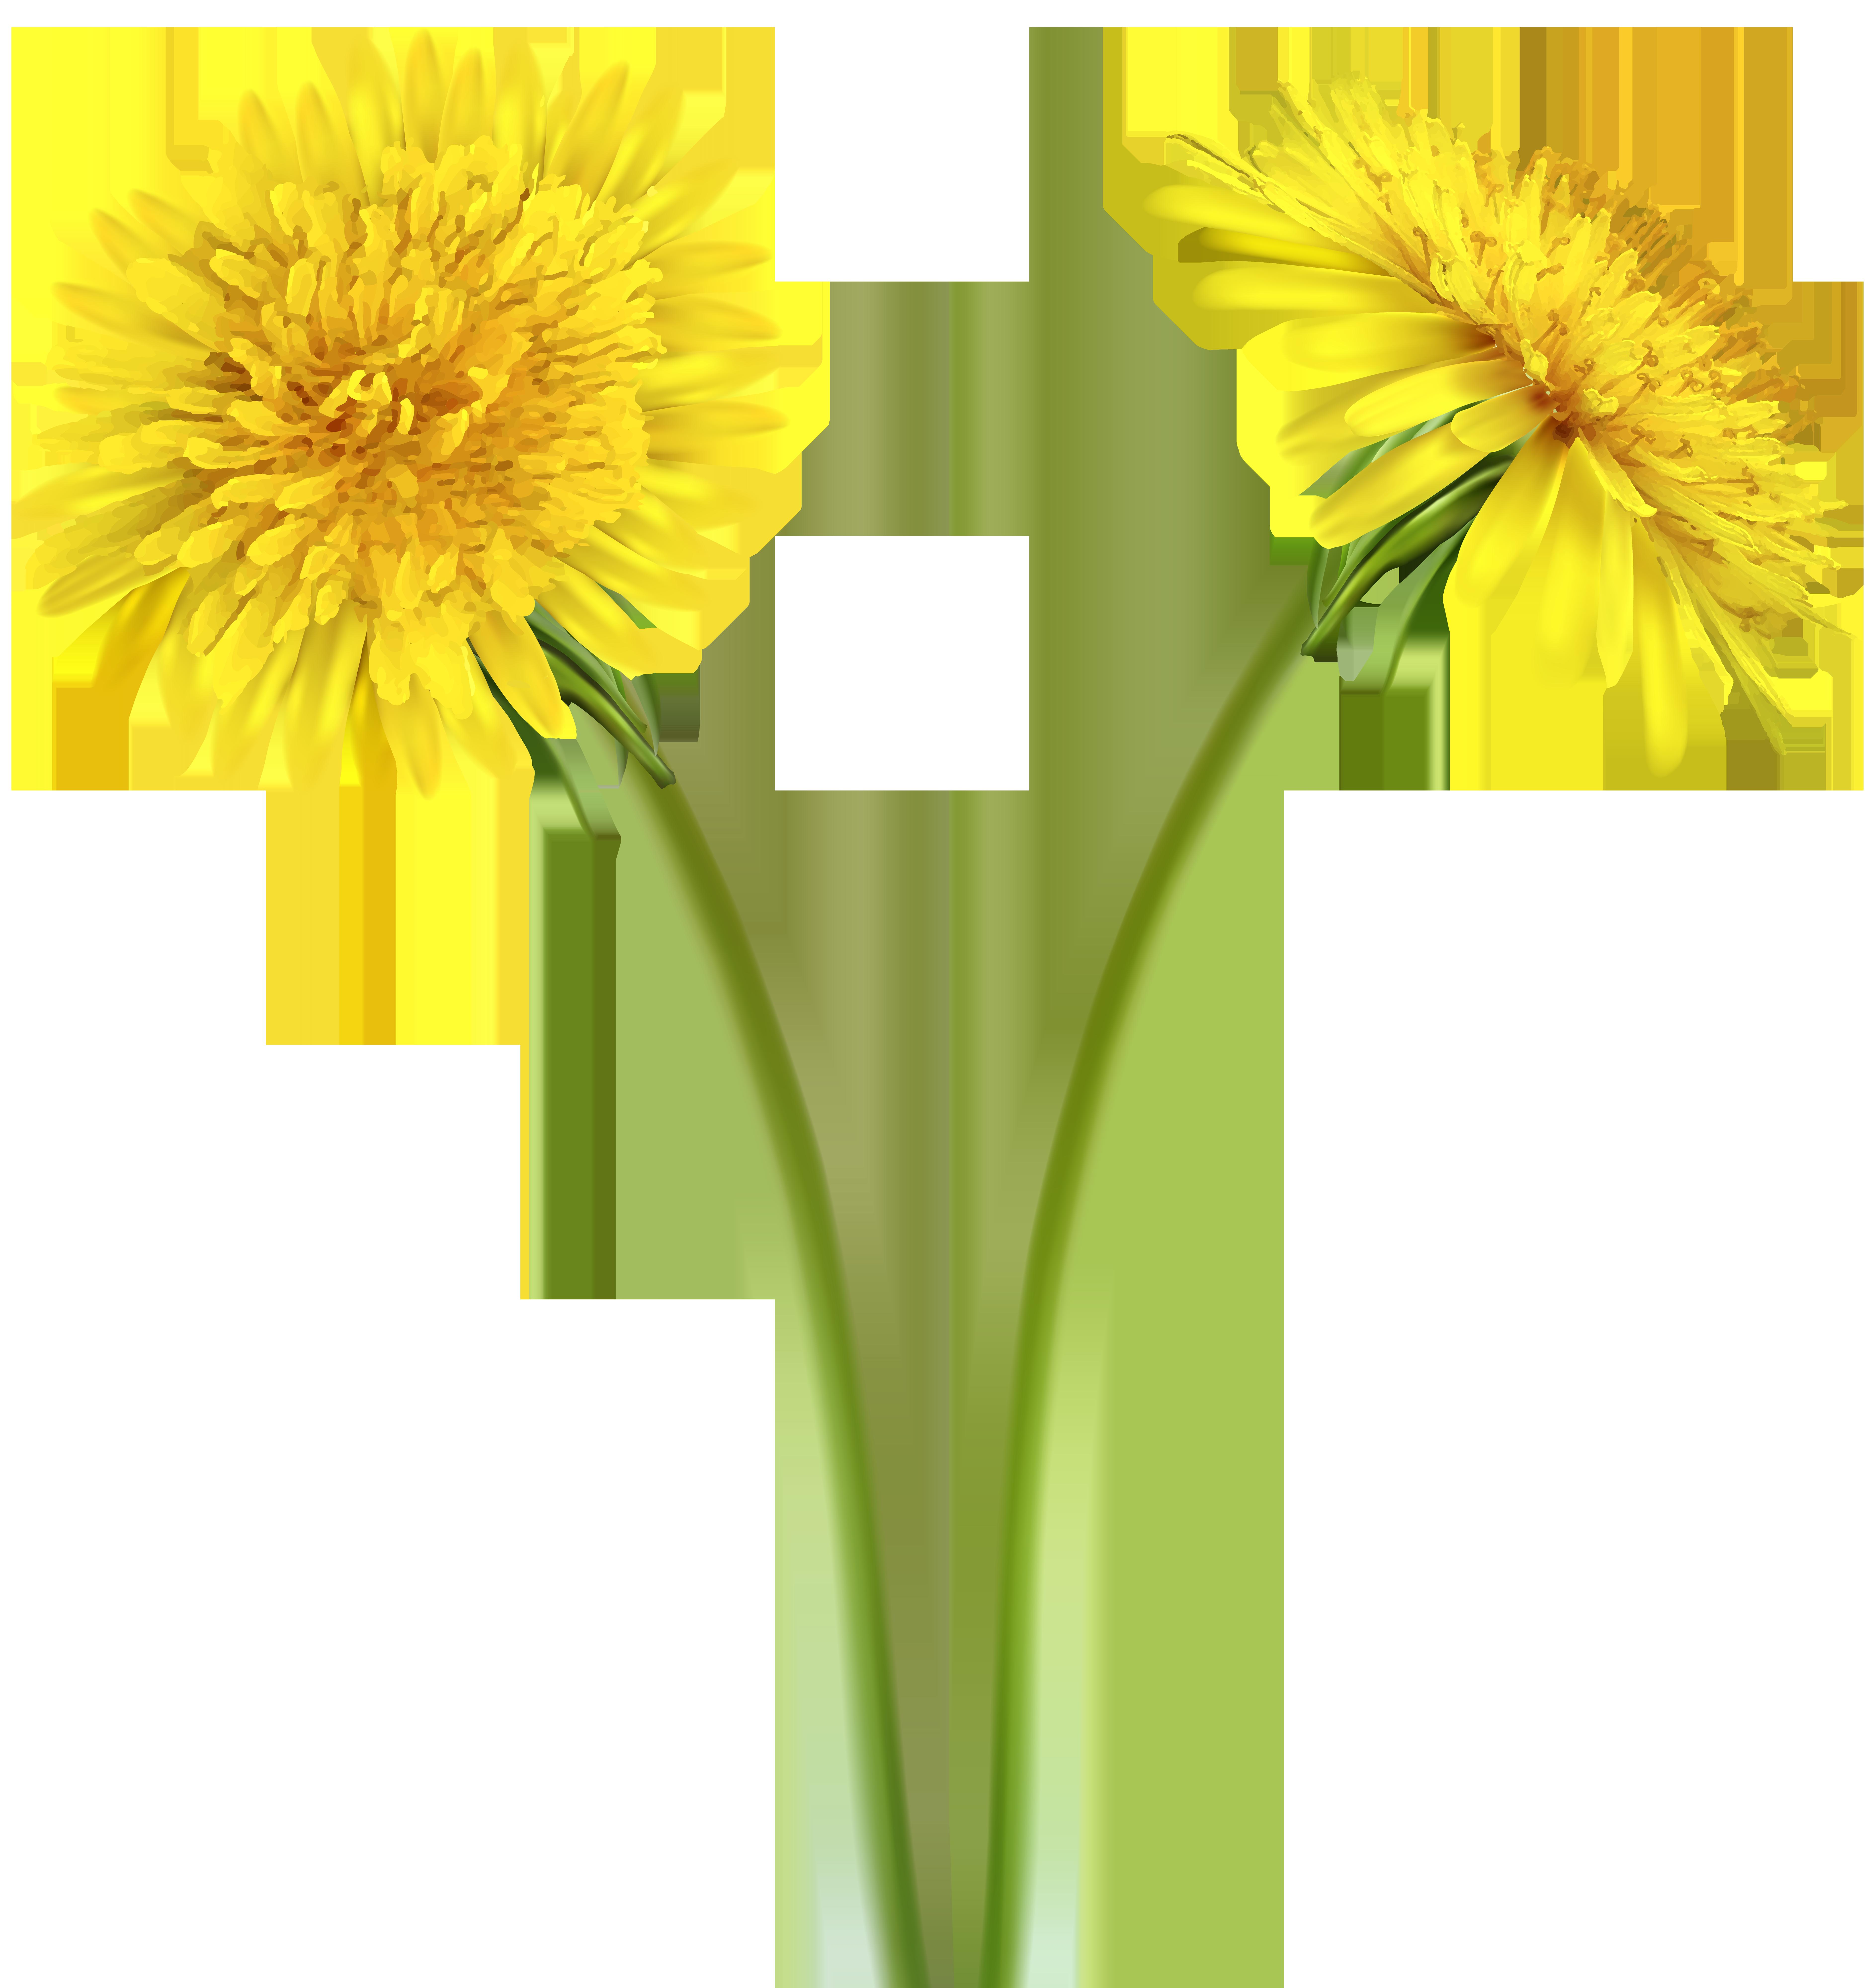 Dandelion flower clipart svg freeuse stock Dandelions Transparent Clip Art Image   Gallery Yopriceville - High ... svg freeuse stock